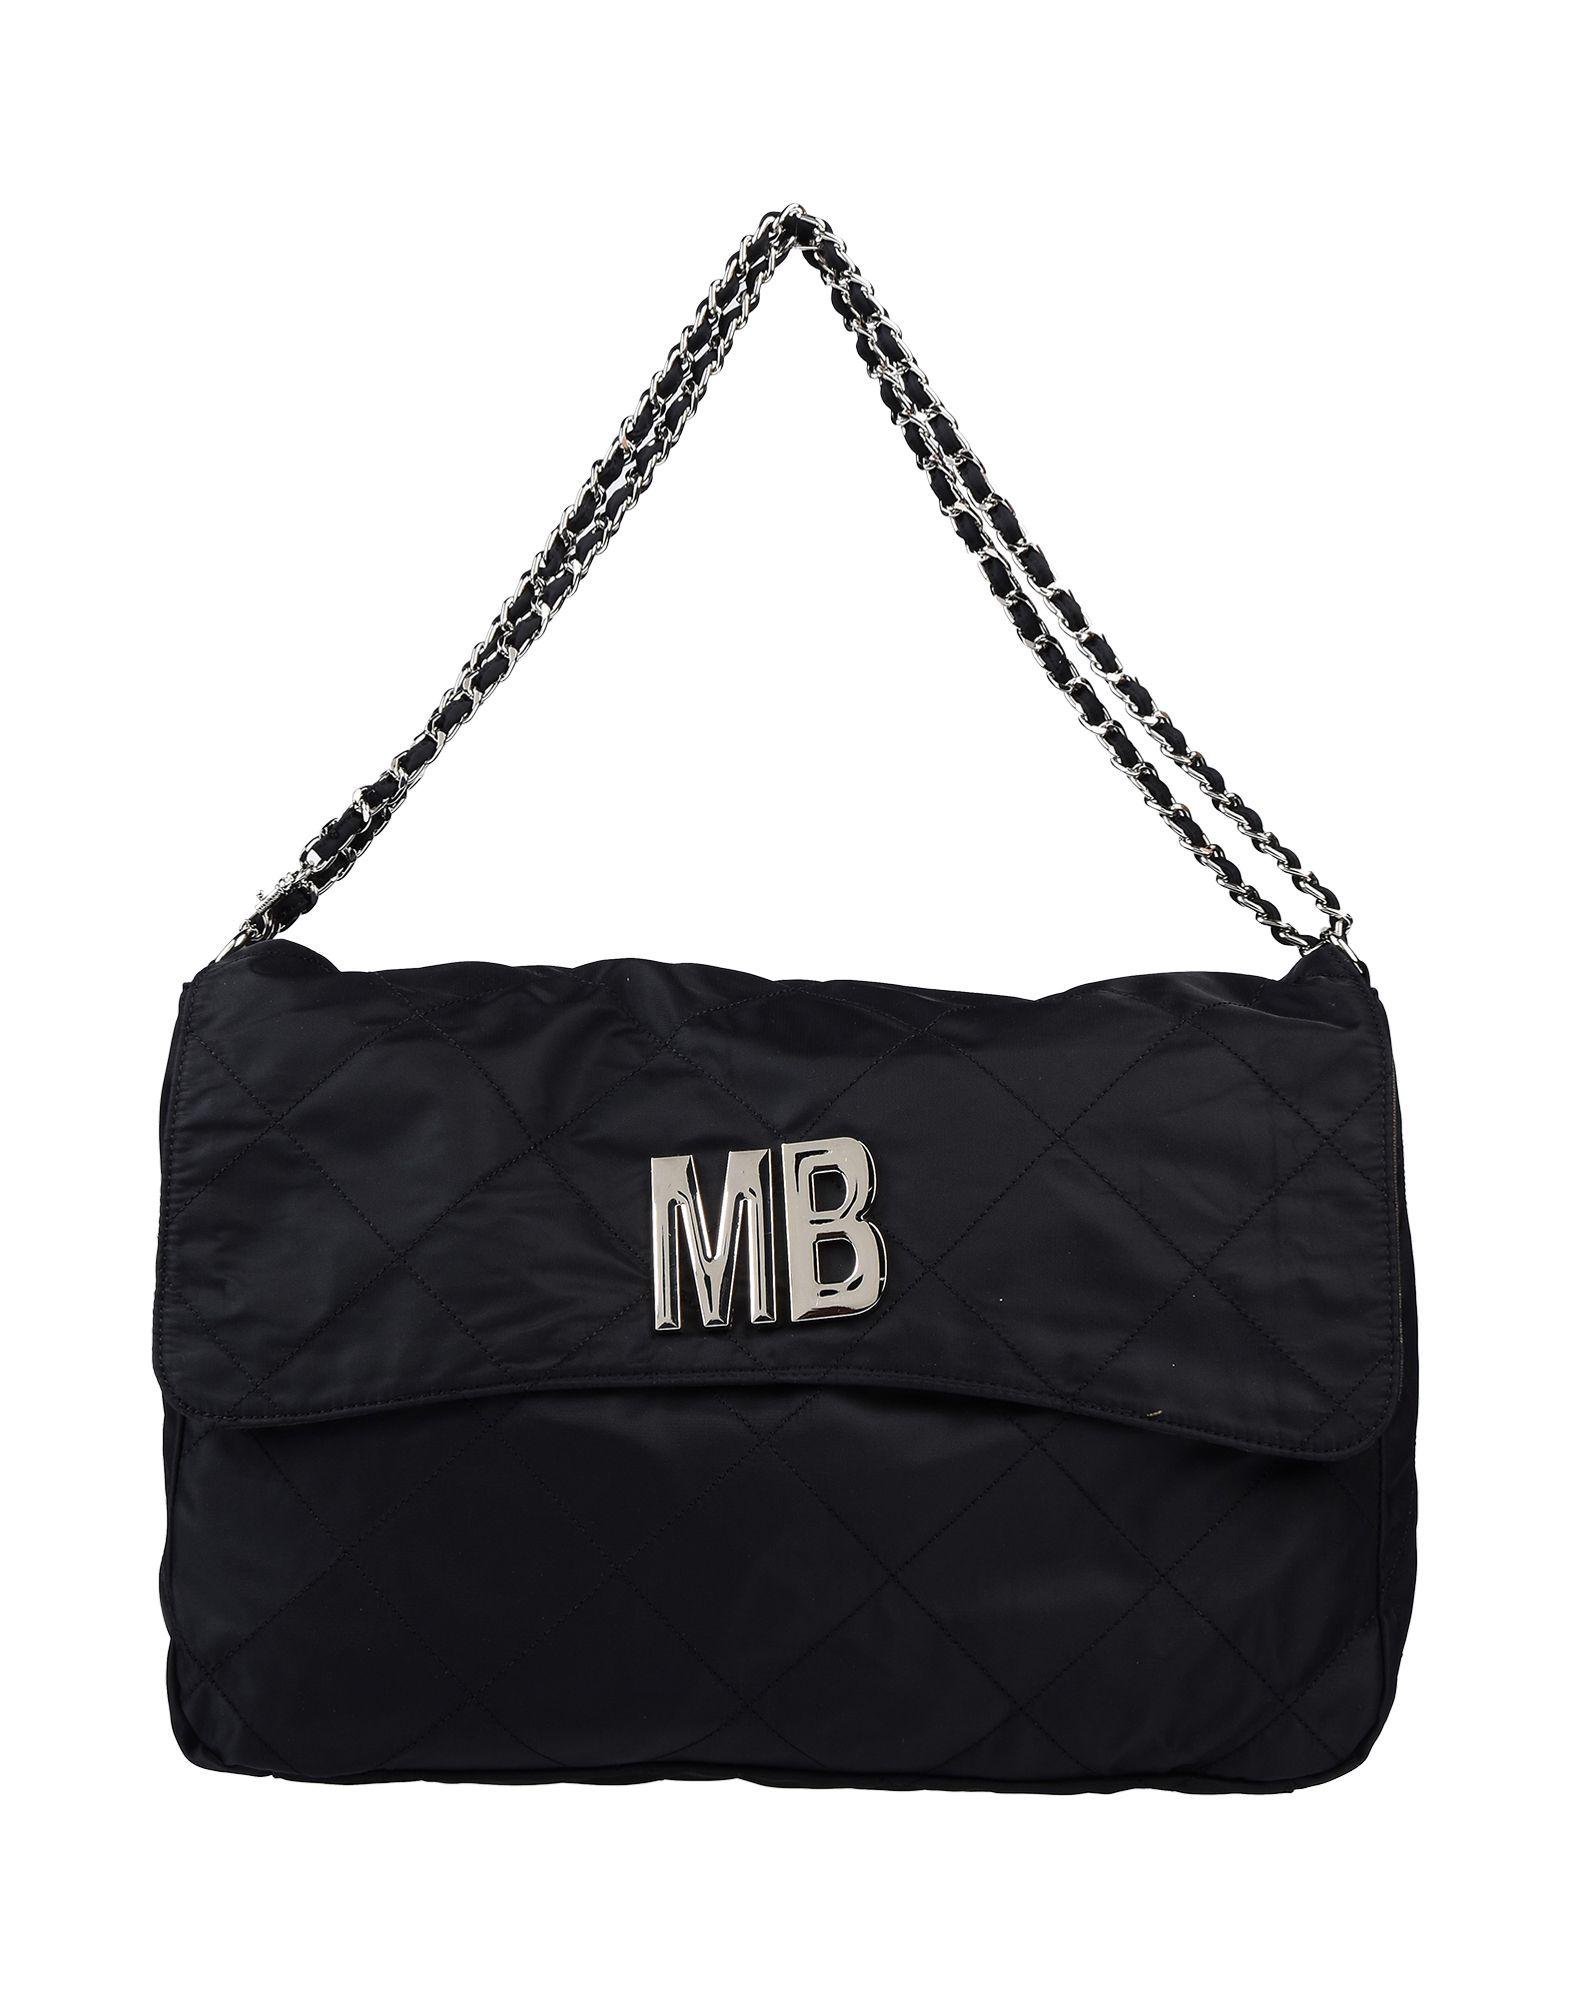 MIA BAG Сумка через плечо сумка через плечо women handbag pu lz22 142 women messenger bags shoulder bag